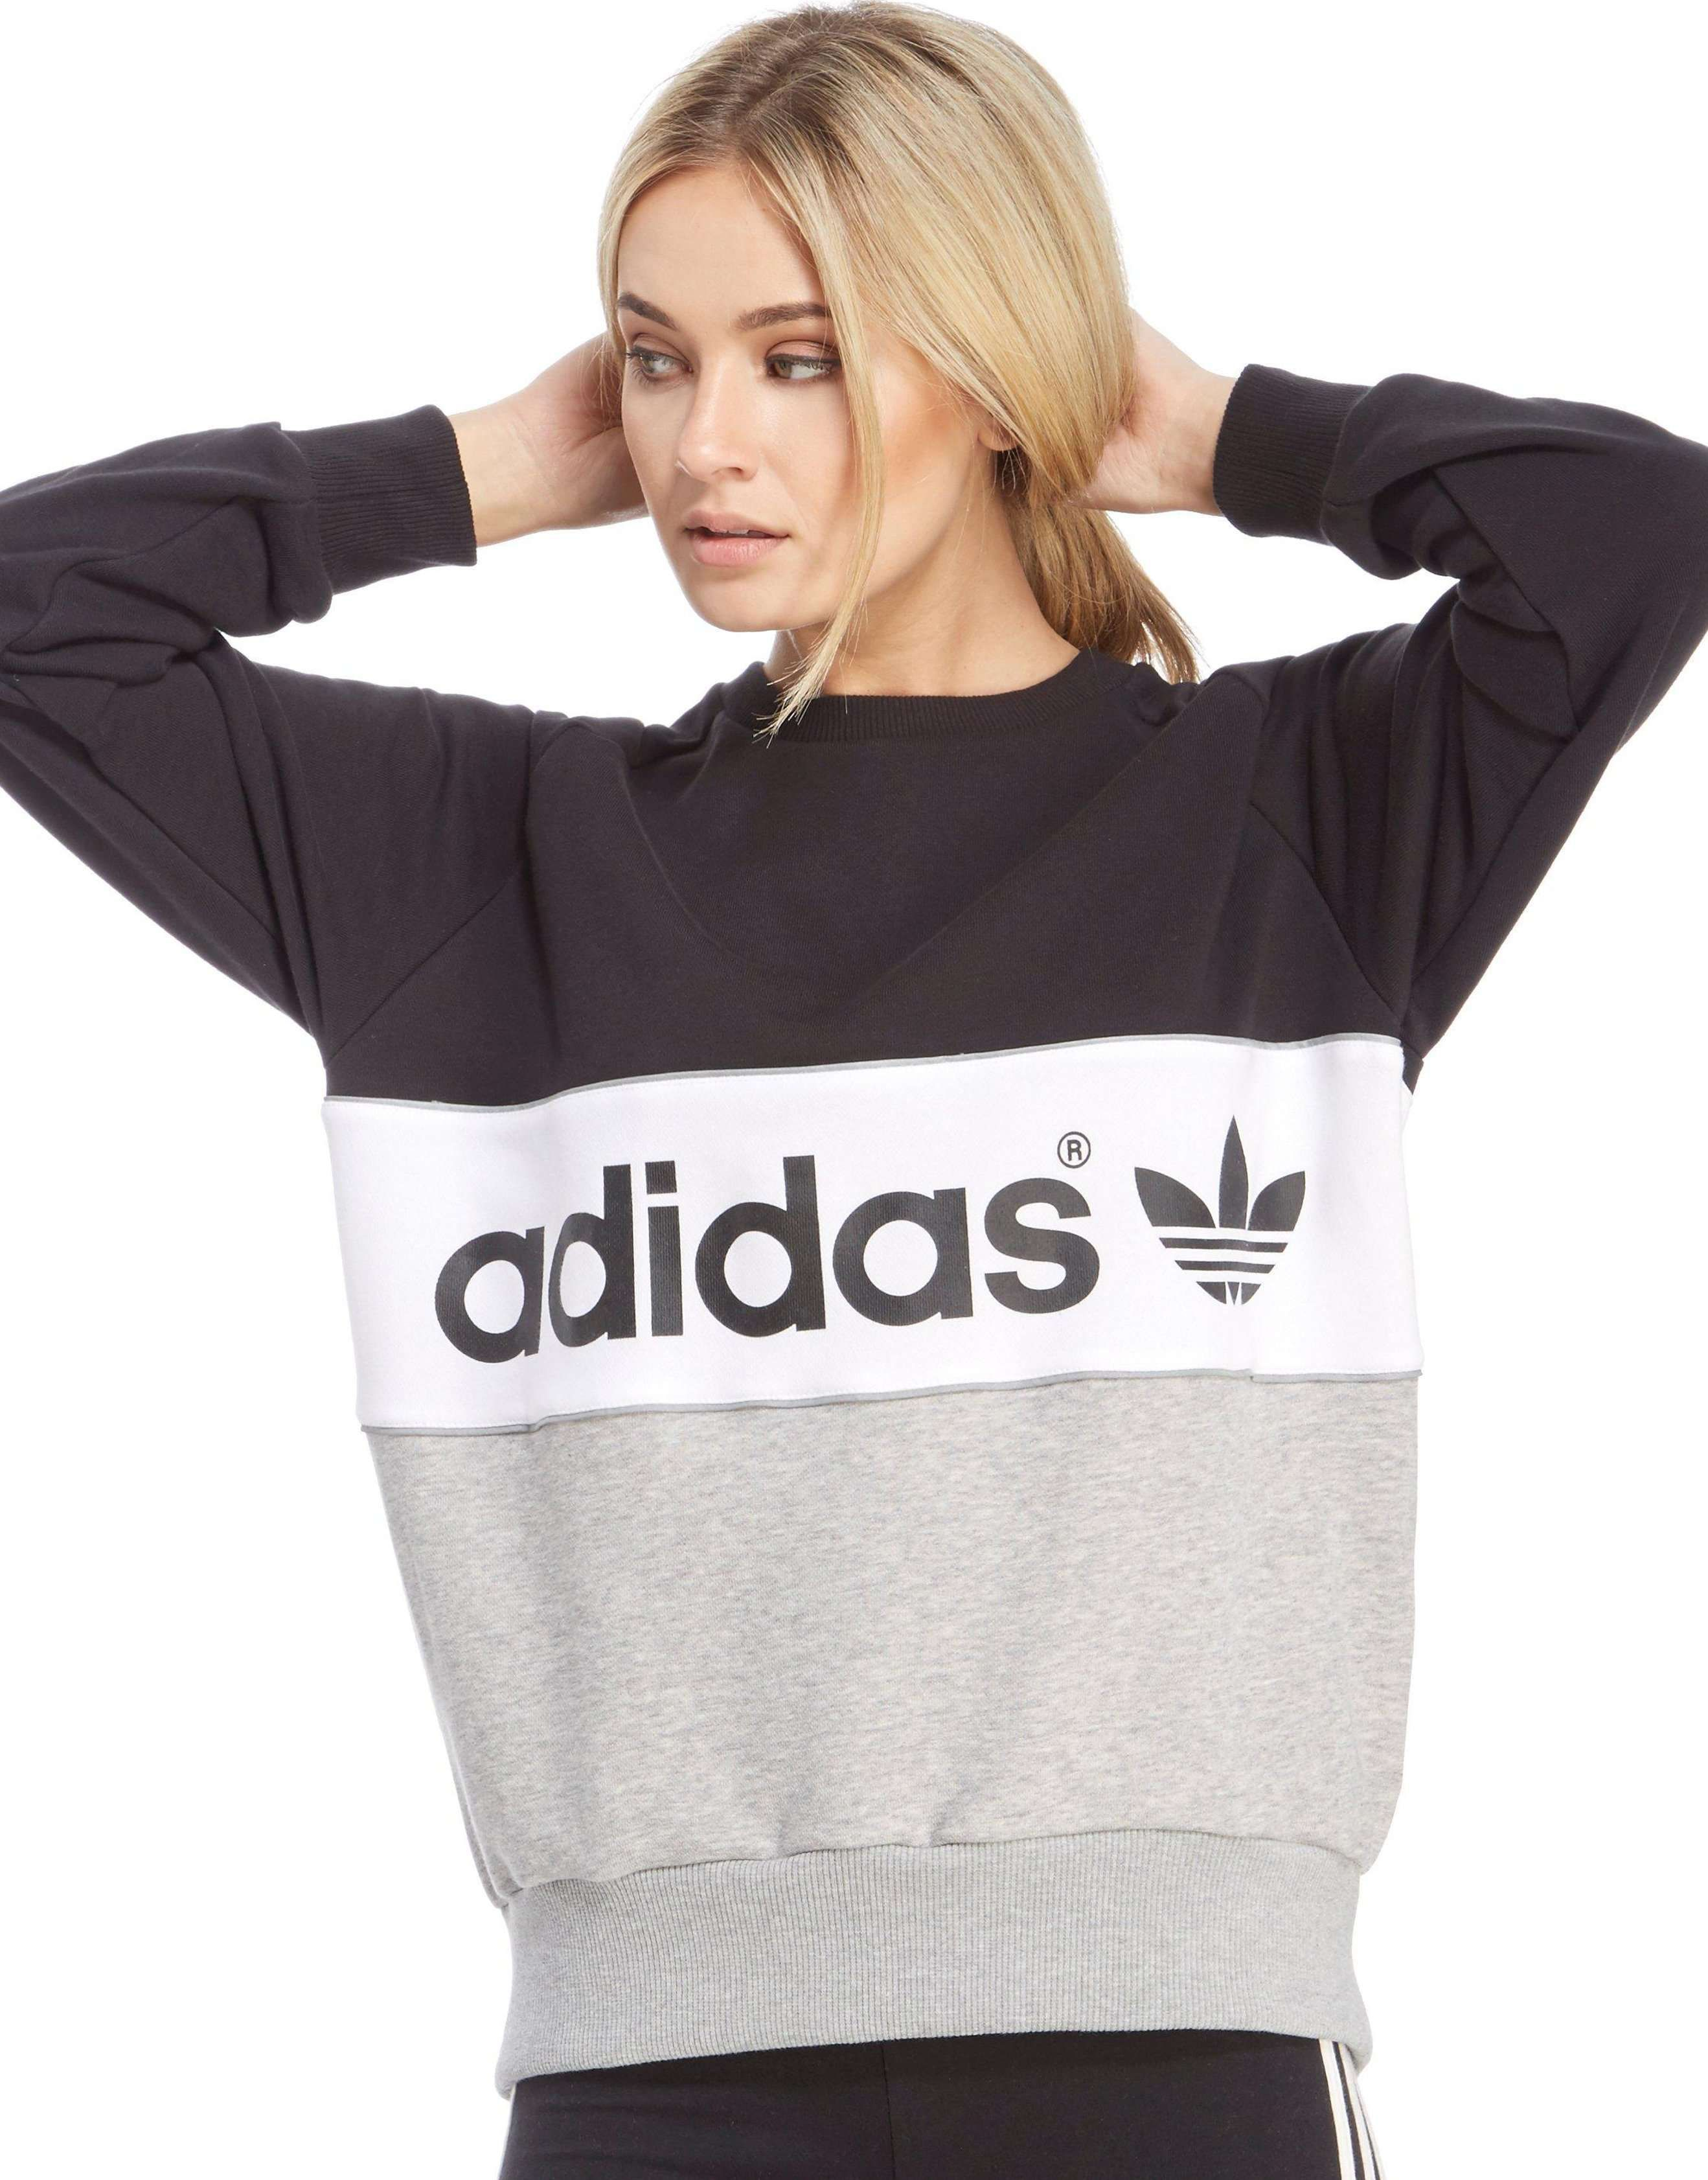 adidas Originals Authentic Crew Sweatshirt - Shop online for ...